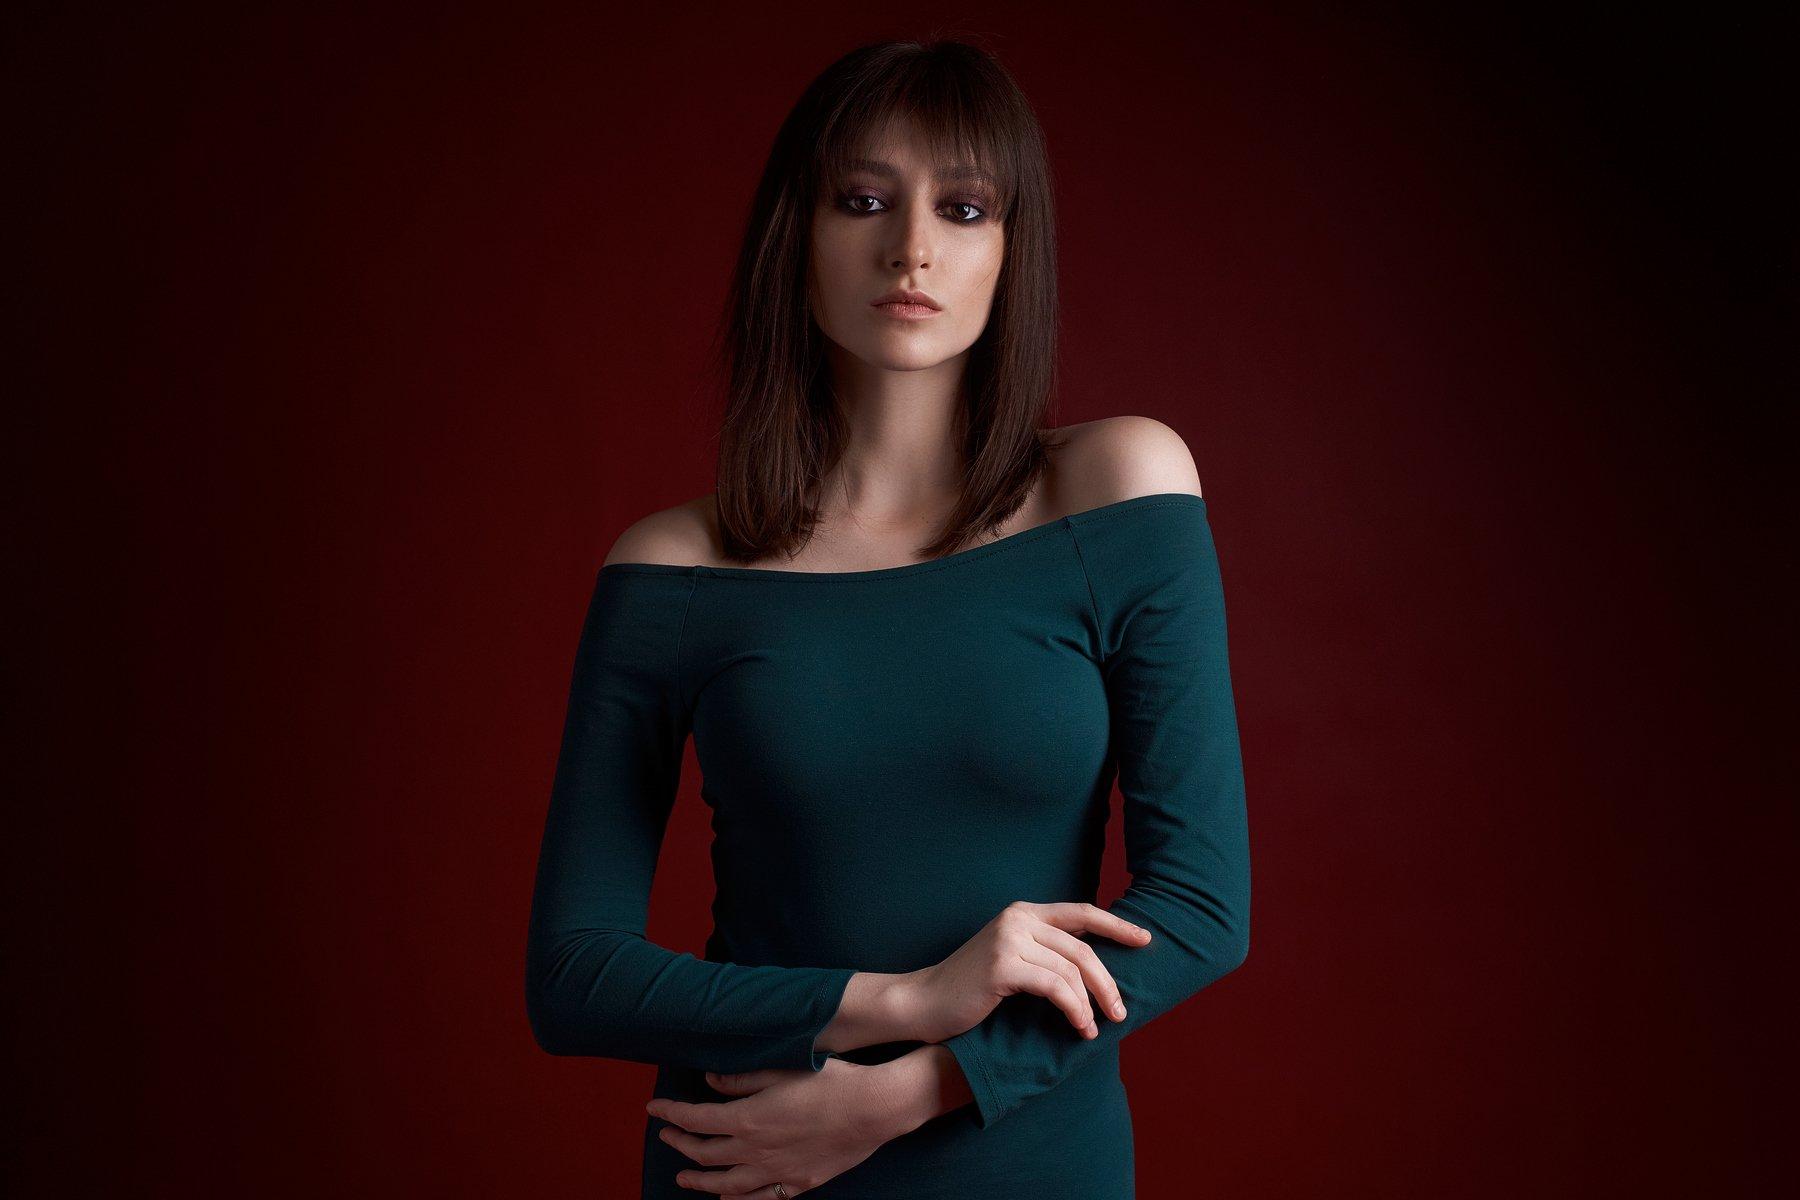 портрет, девушка, portrait, girl, eyes, beauty, low key, Наташа Высоцкая